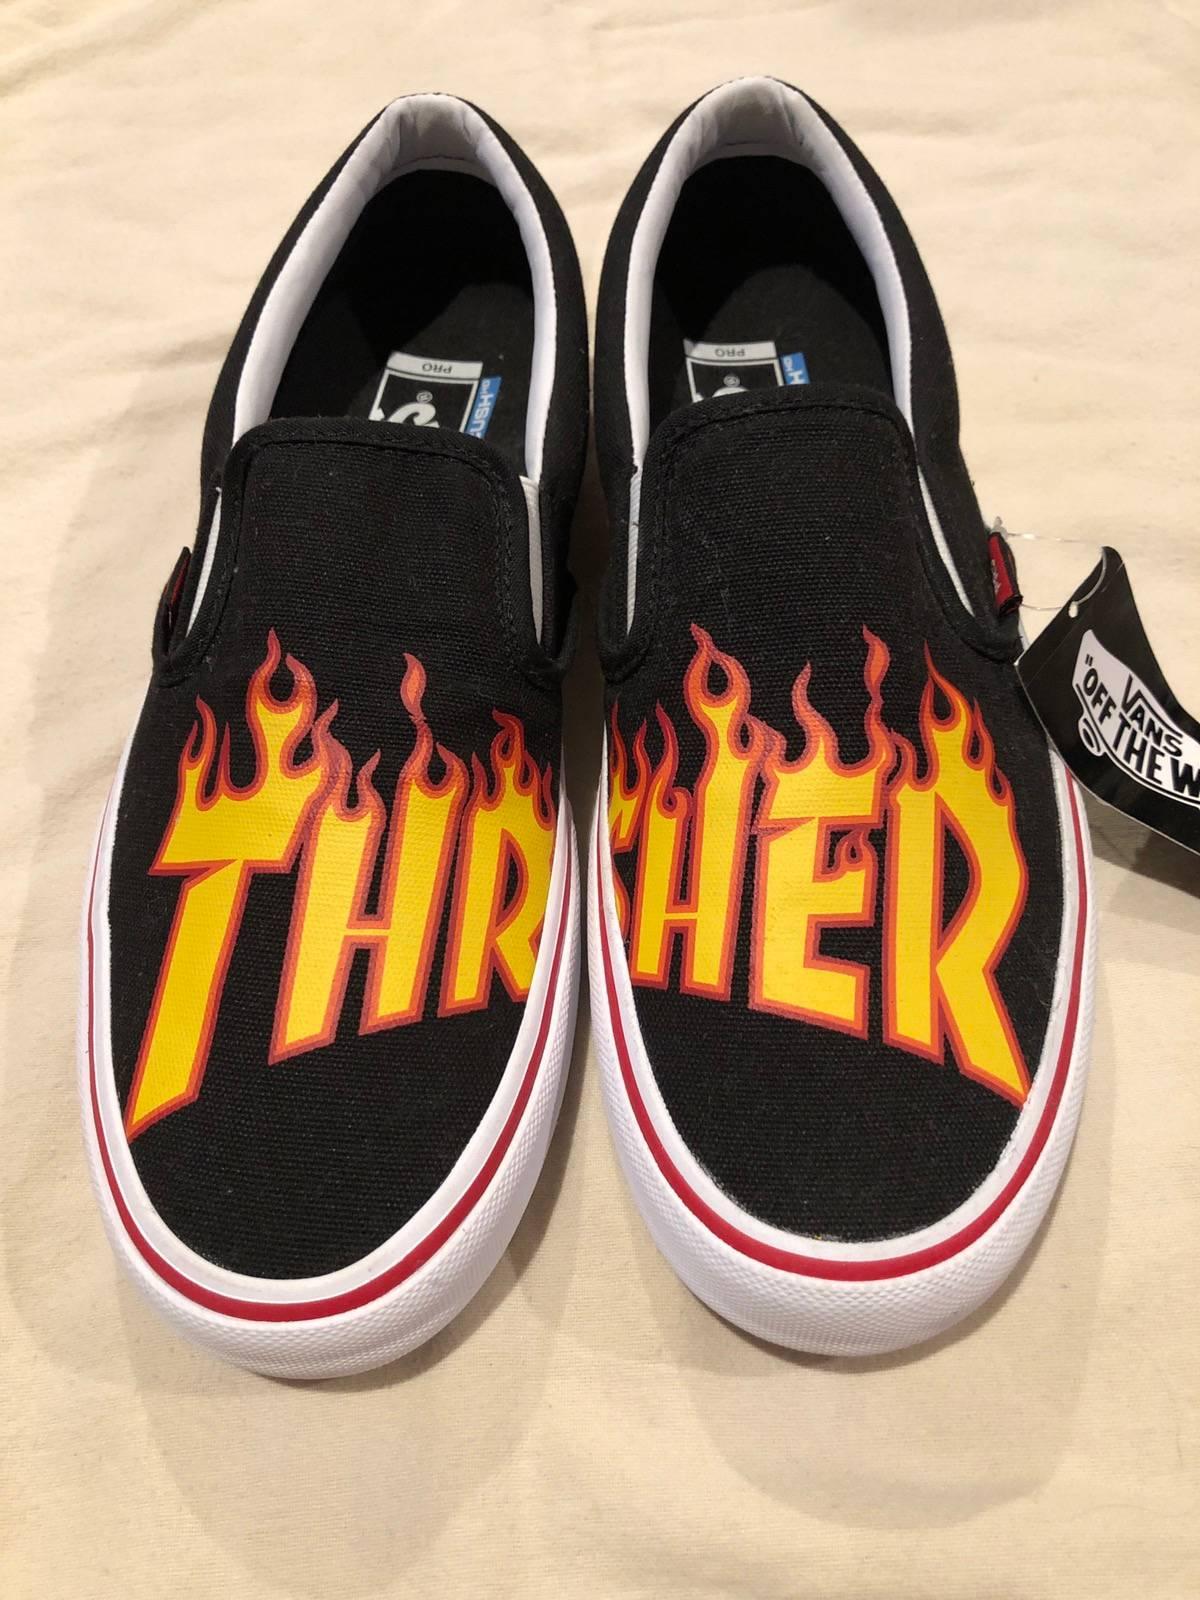 Vans Thrasher Flame Vans